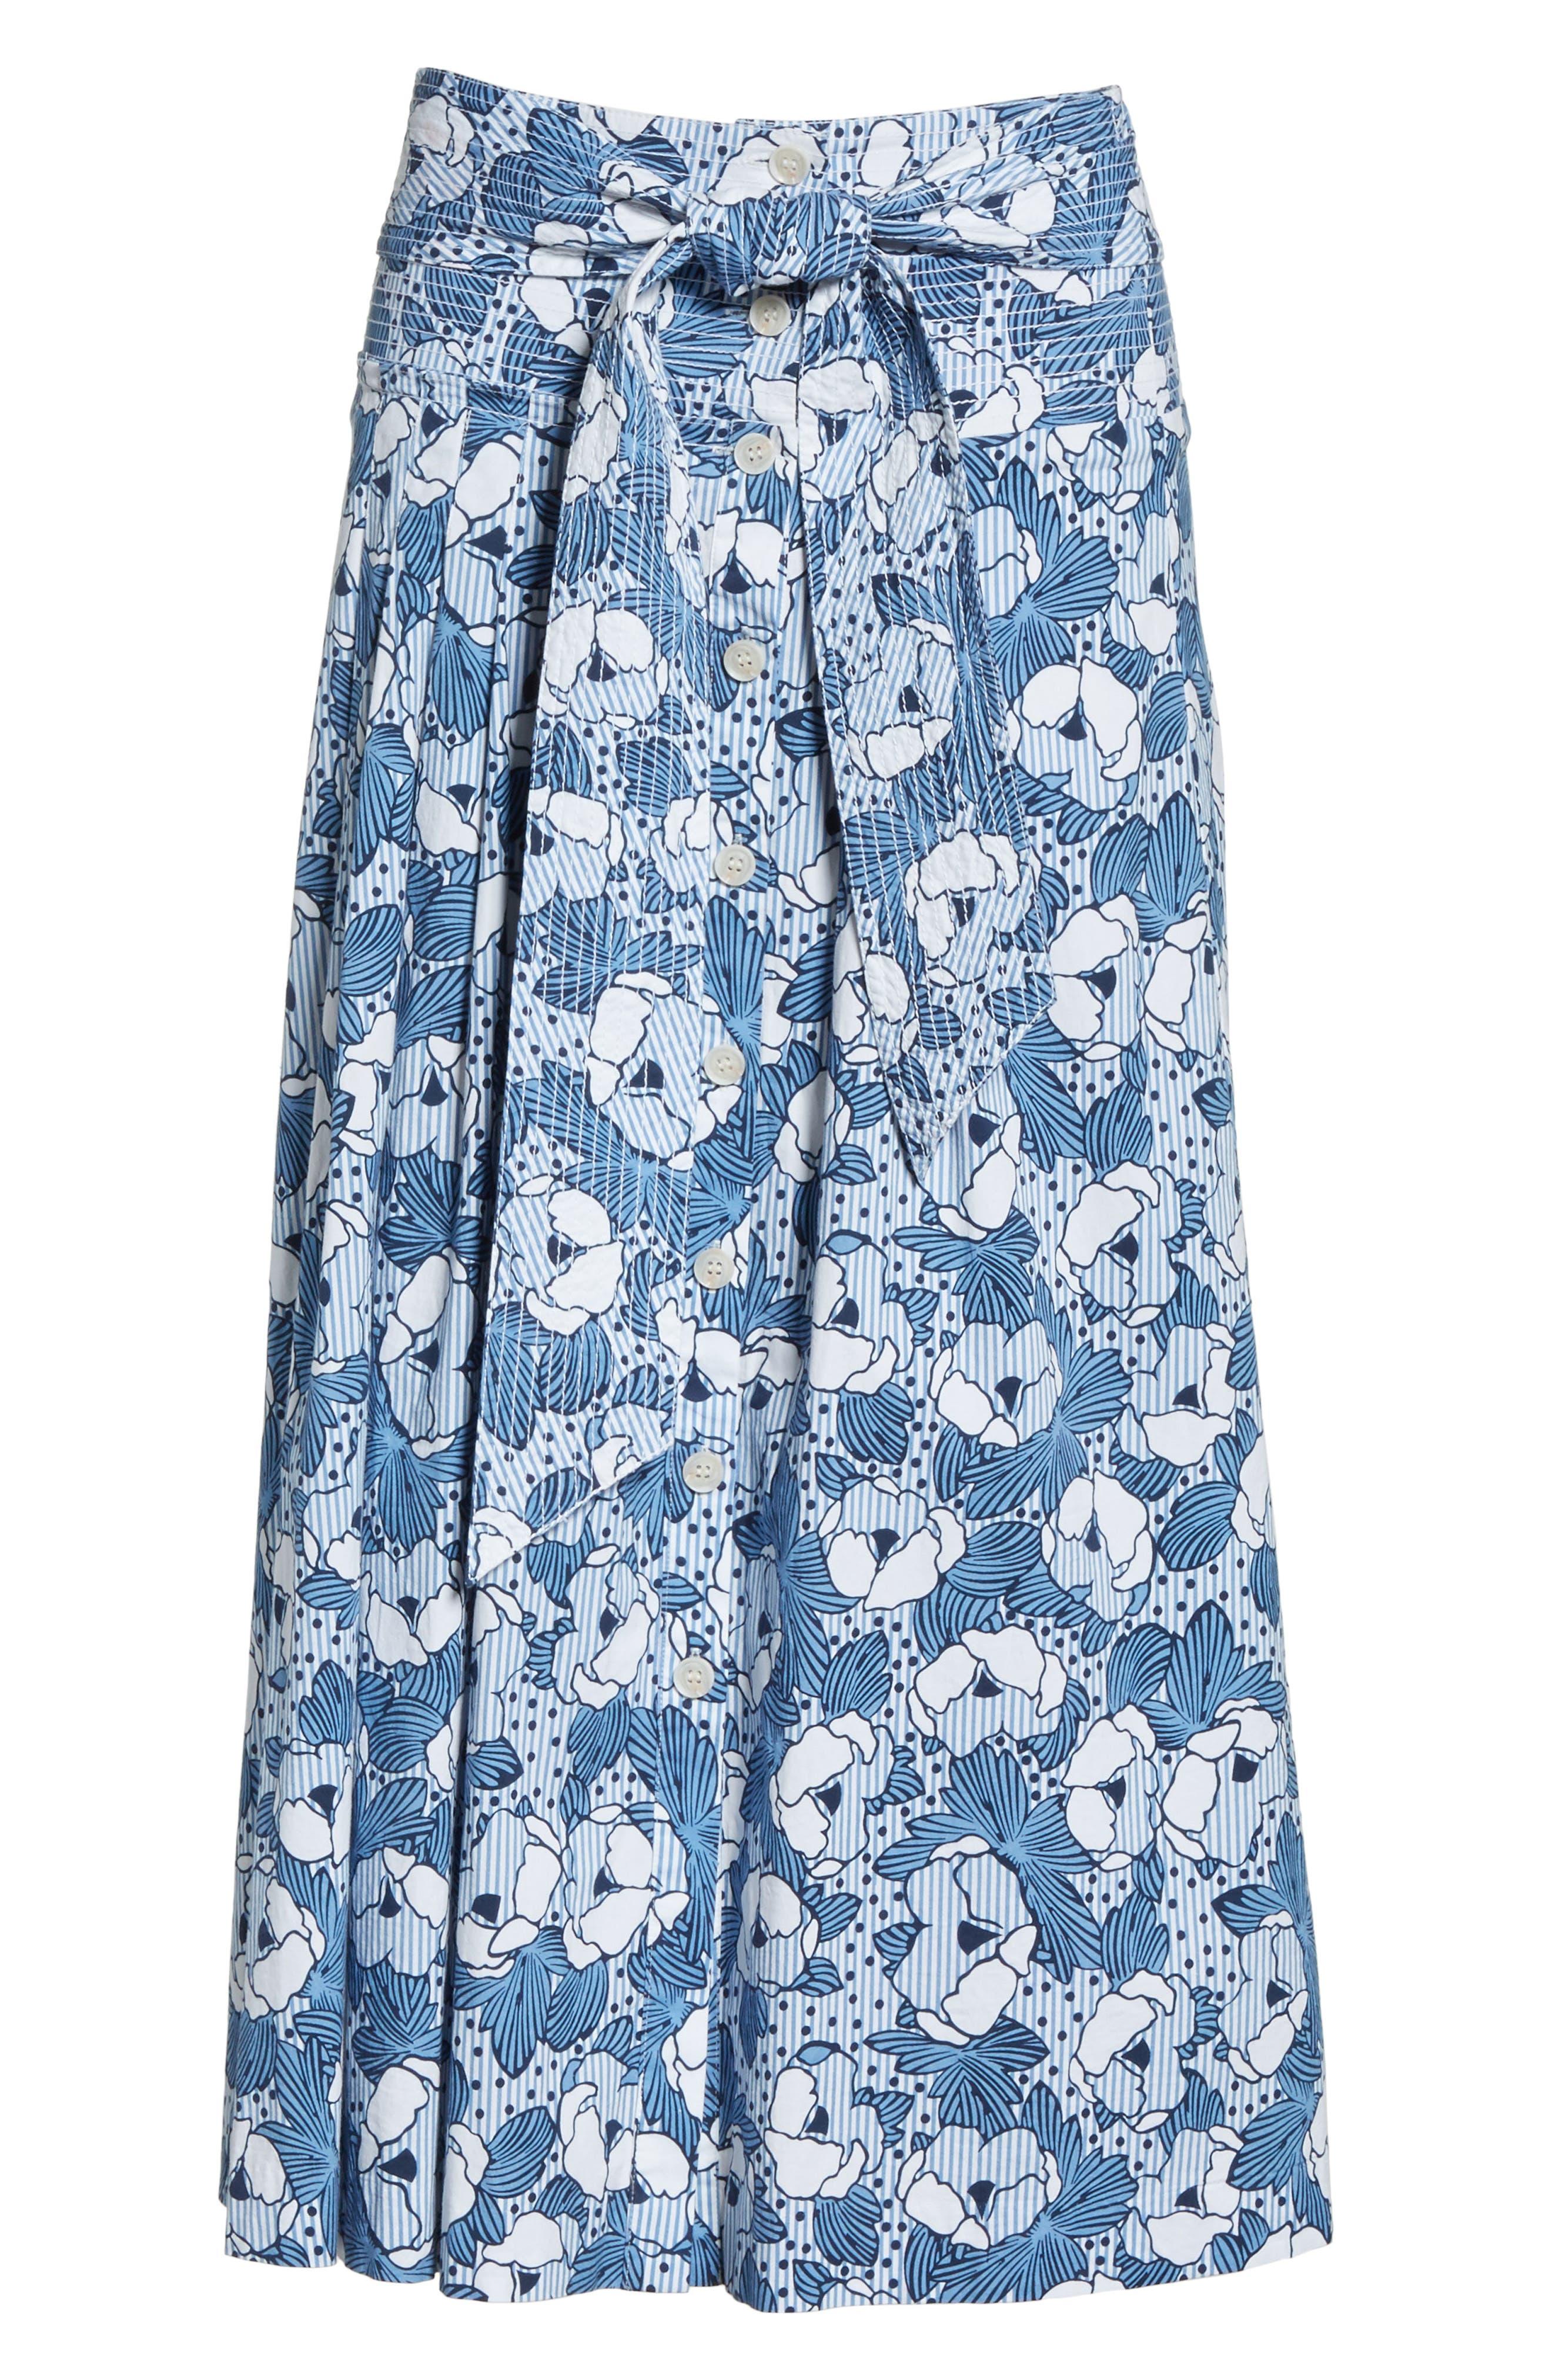 Caralina Floral Print Midi Skirt,                             Alternate thumbnail 6, color,                             463